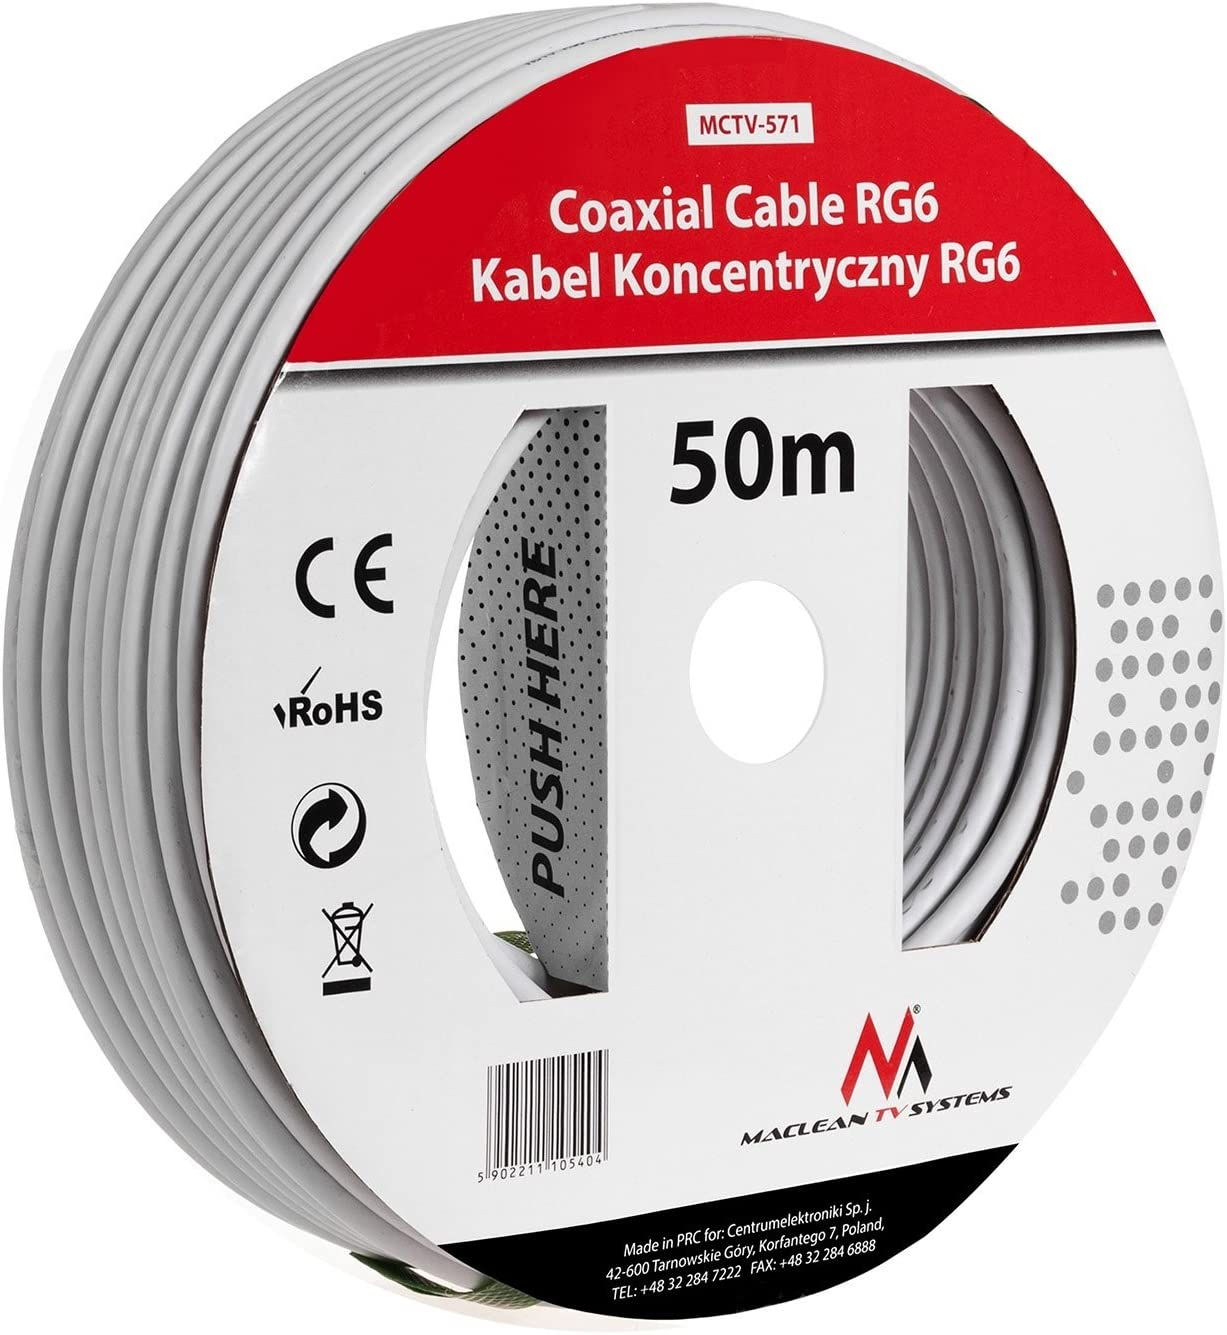 Maclean MCTV-574 - Cable coaxial de antena (25 m, RG6 1.0CSS, SAT)